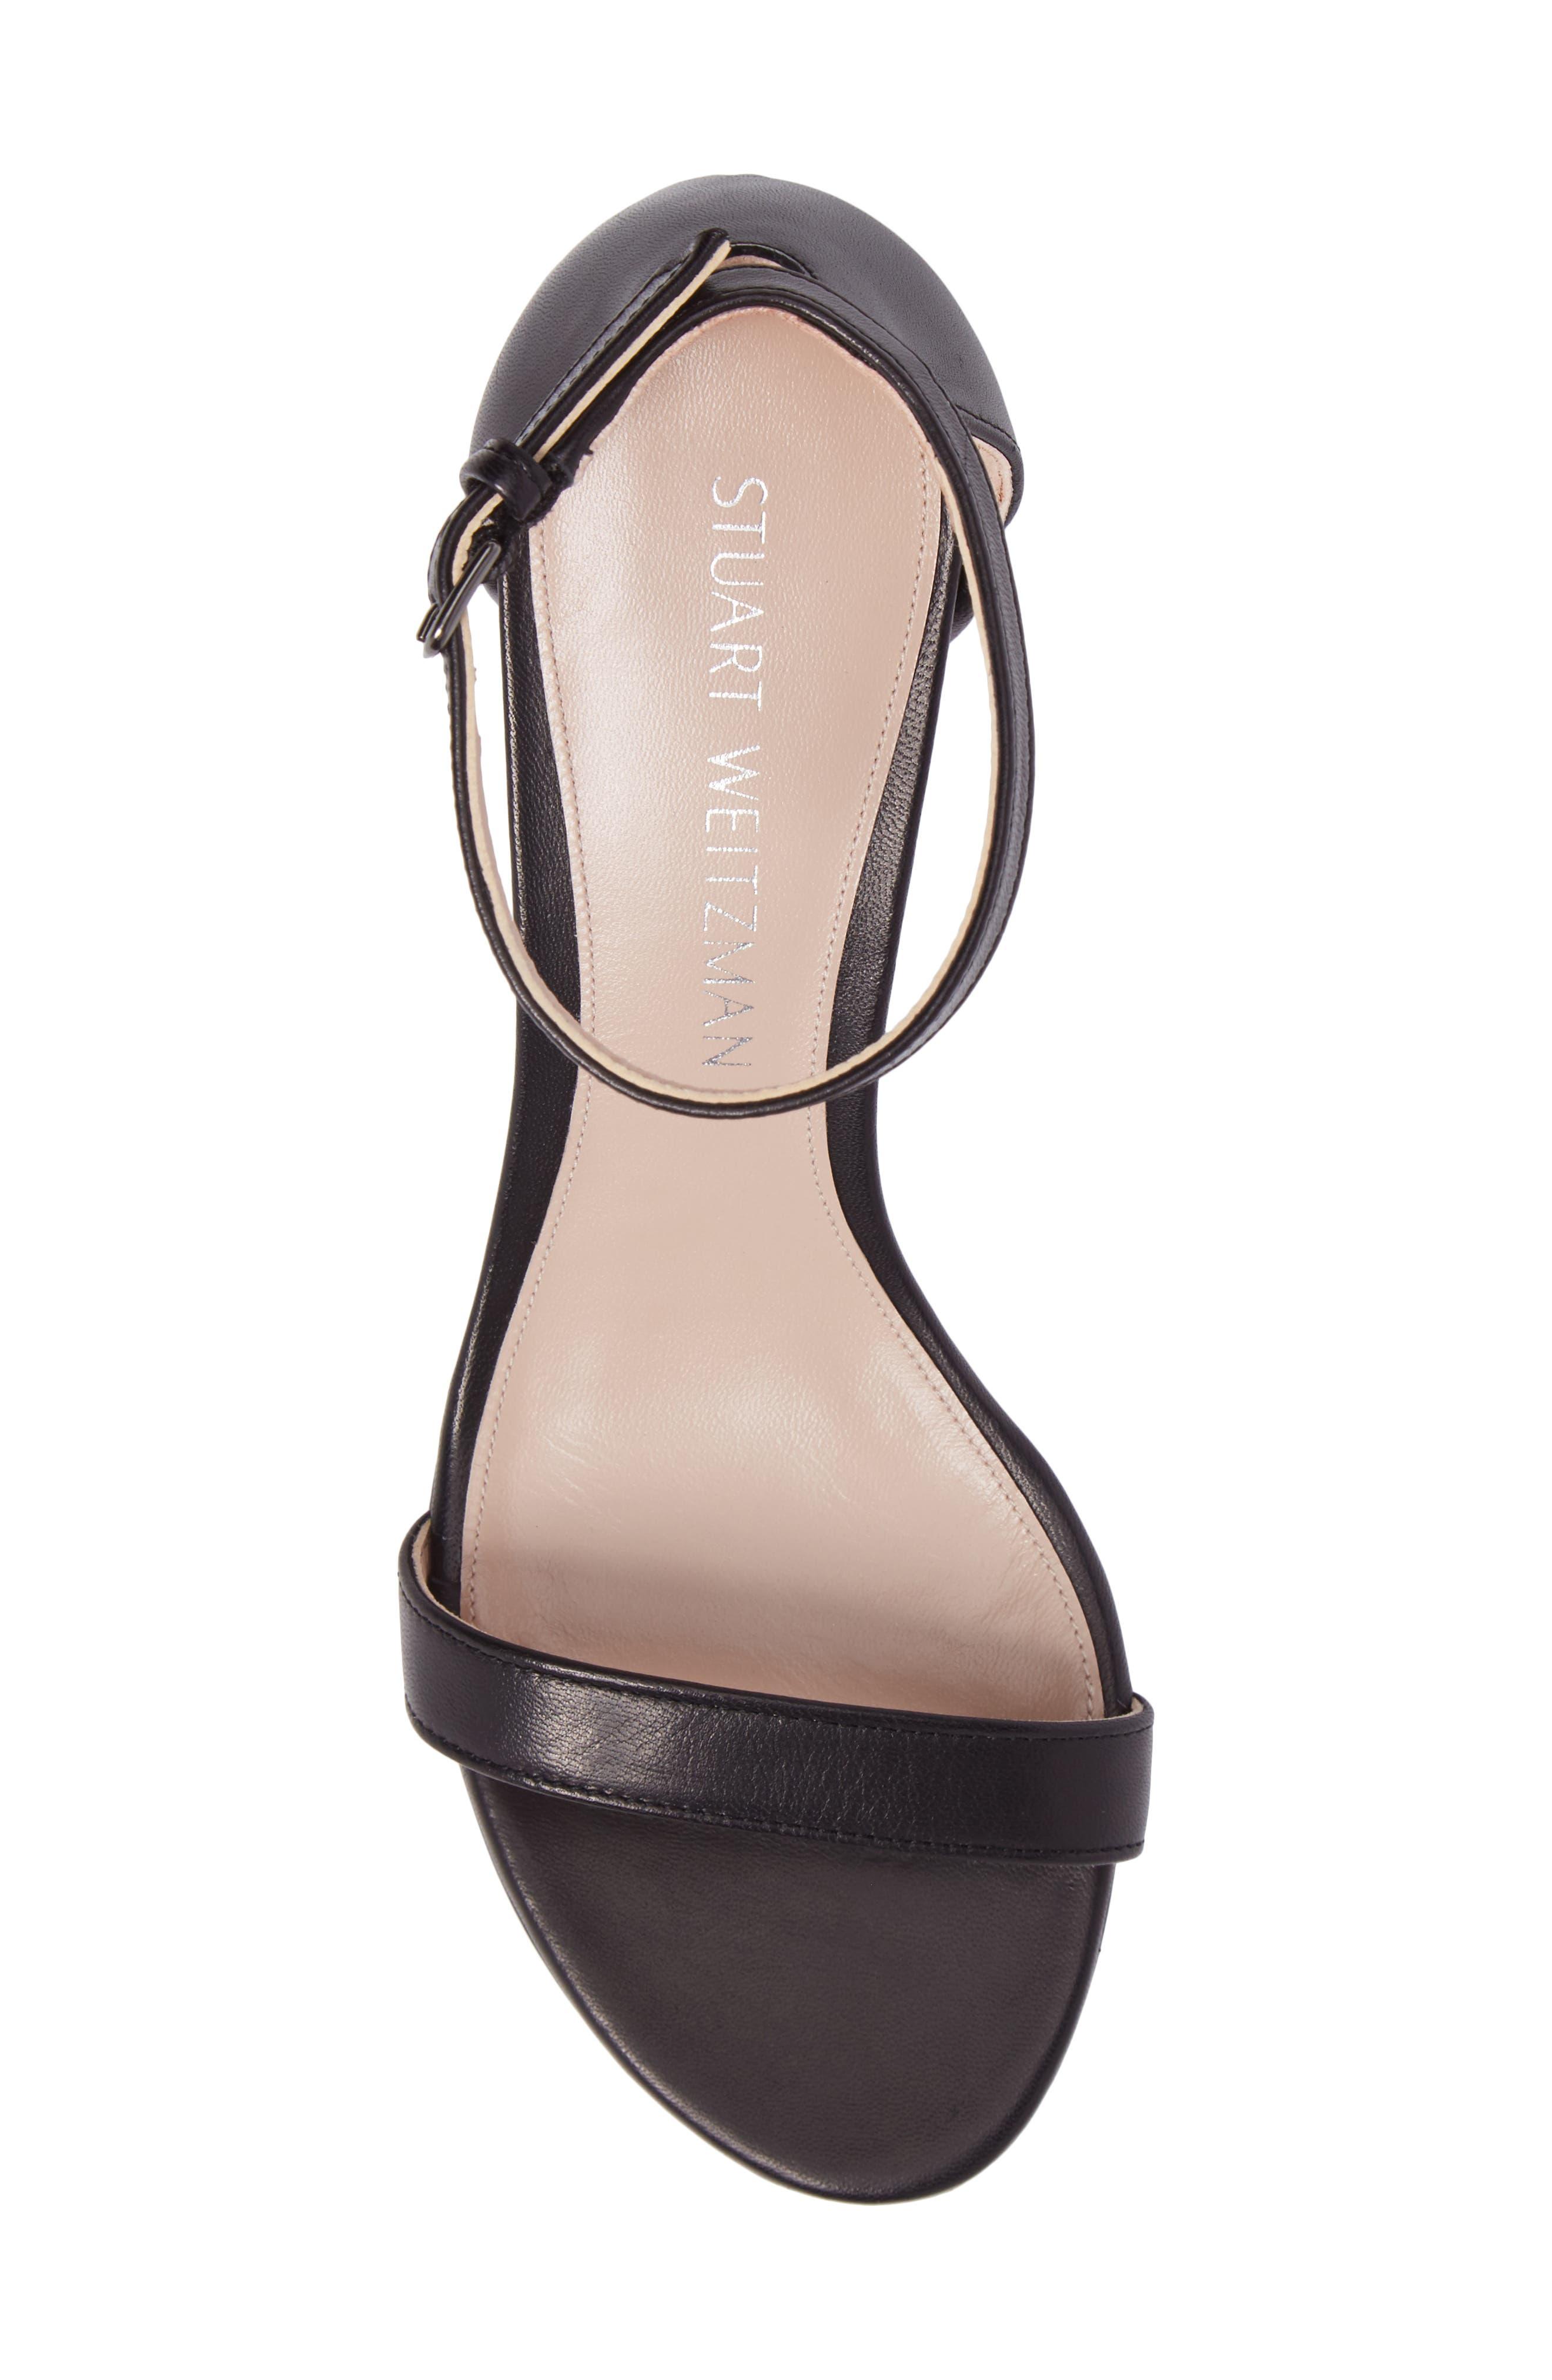 Simple Ankle Strap Sandal,                             Alternate thumbnail 5, color,                             002